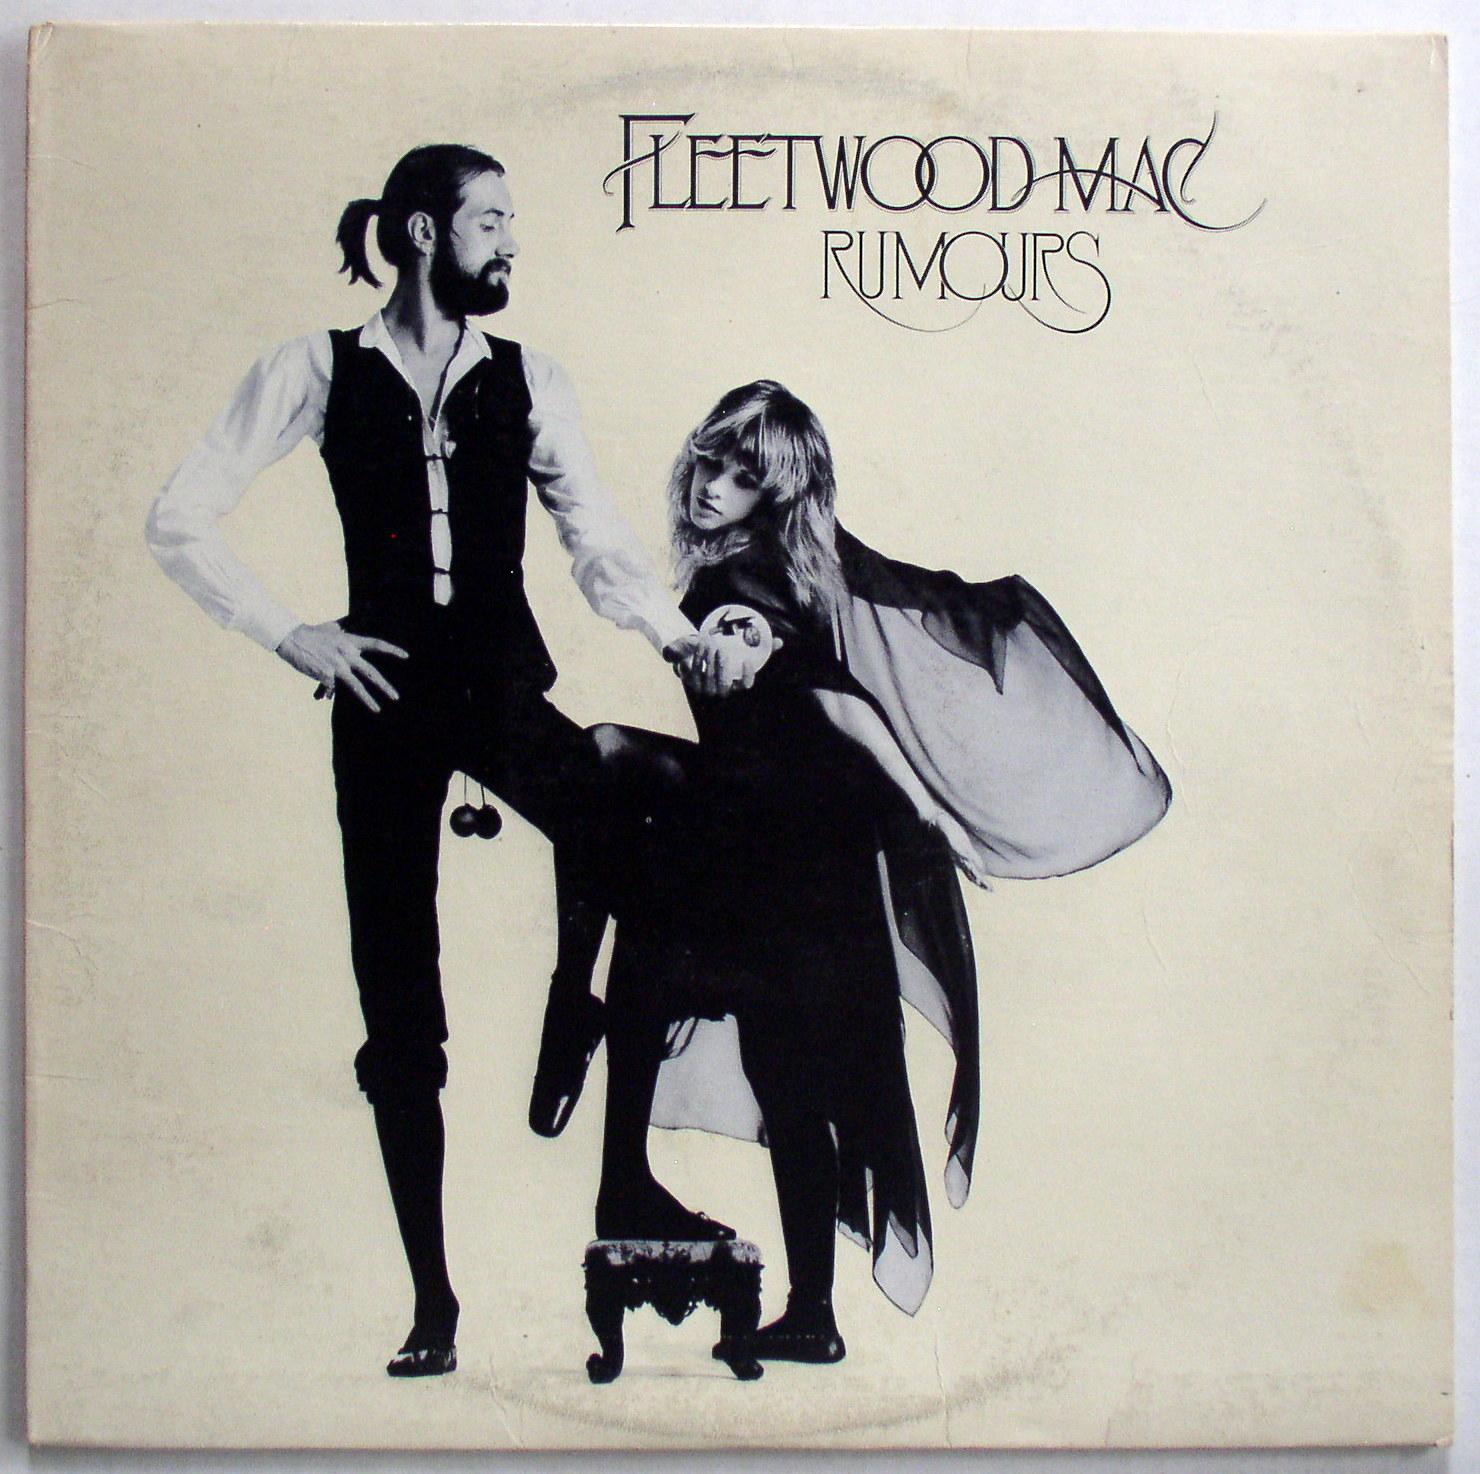 Fleetwood Mac Rumors Lp Original Label Textured Cover